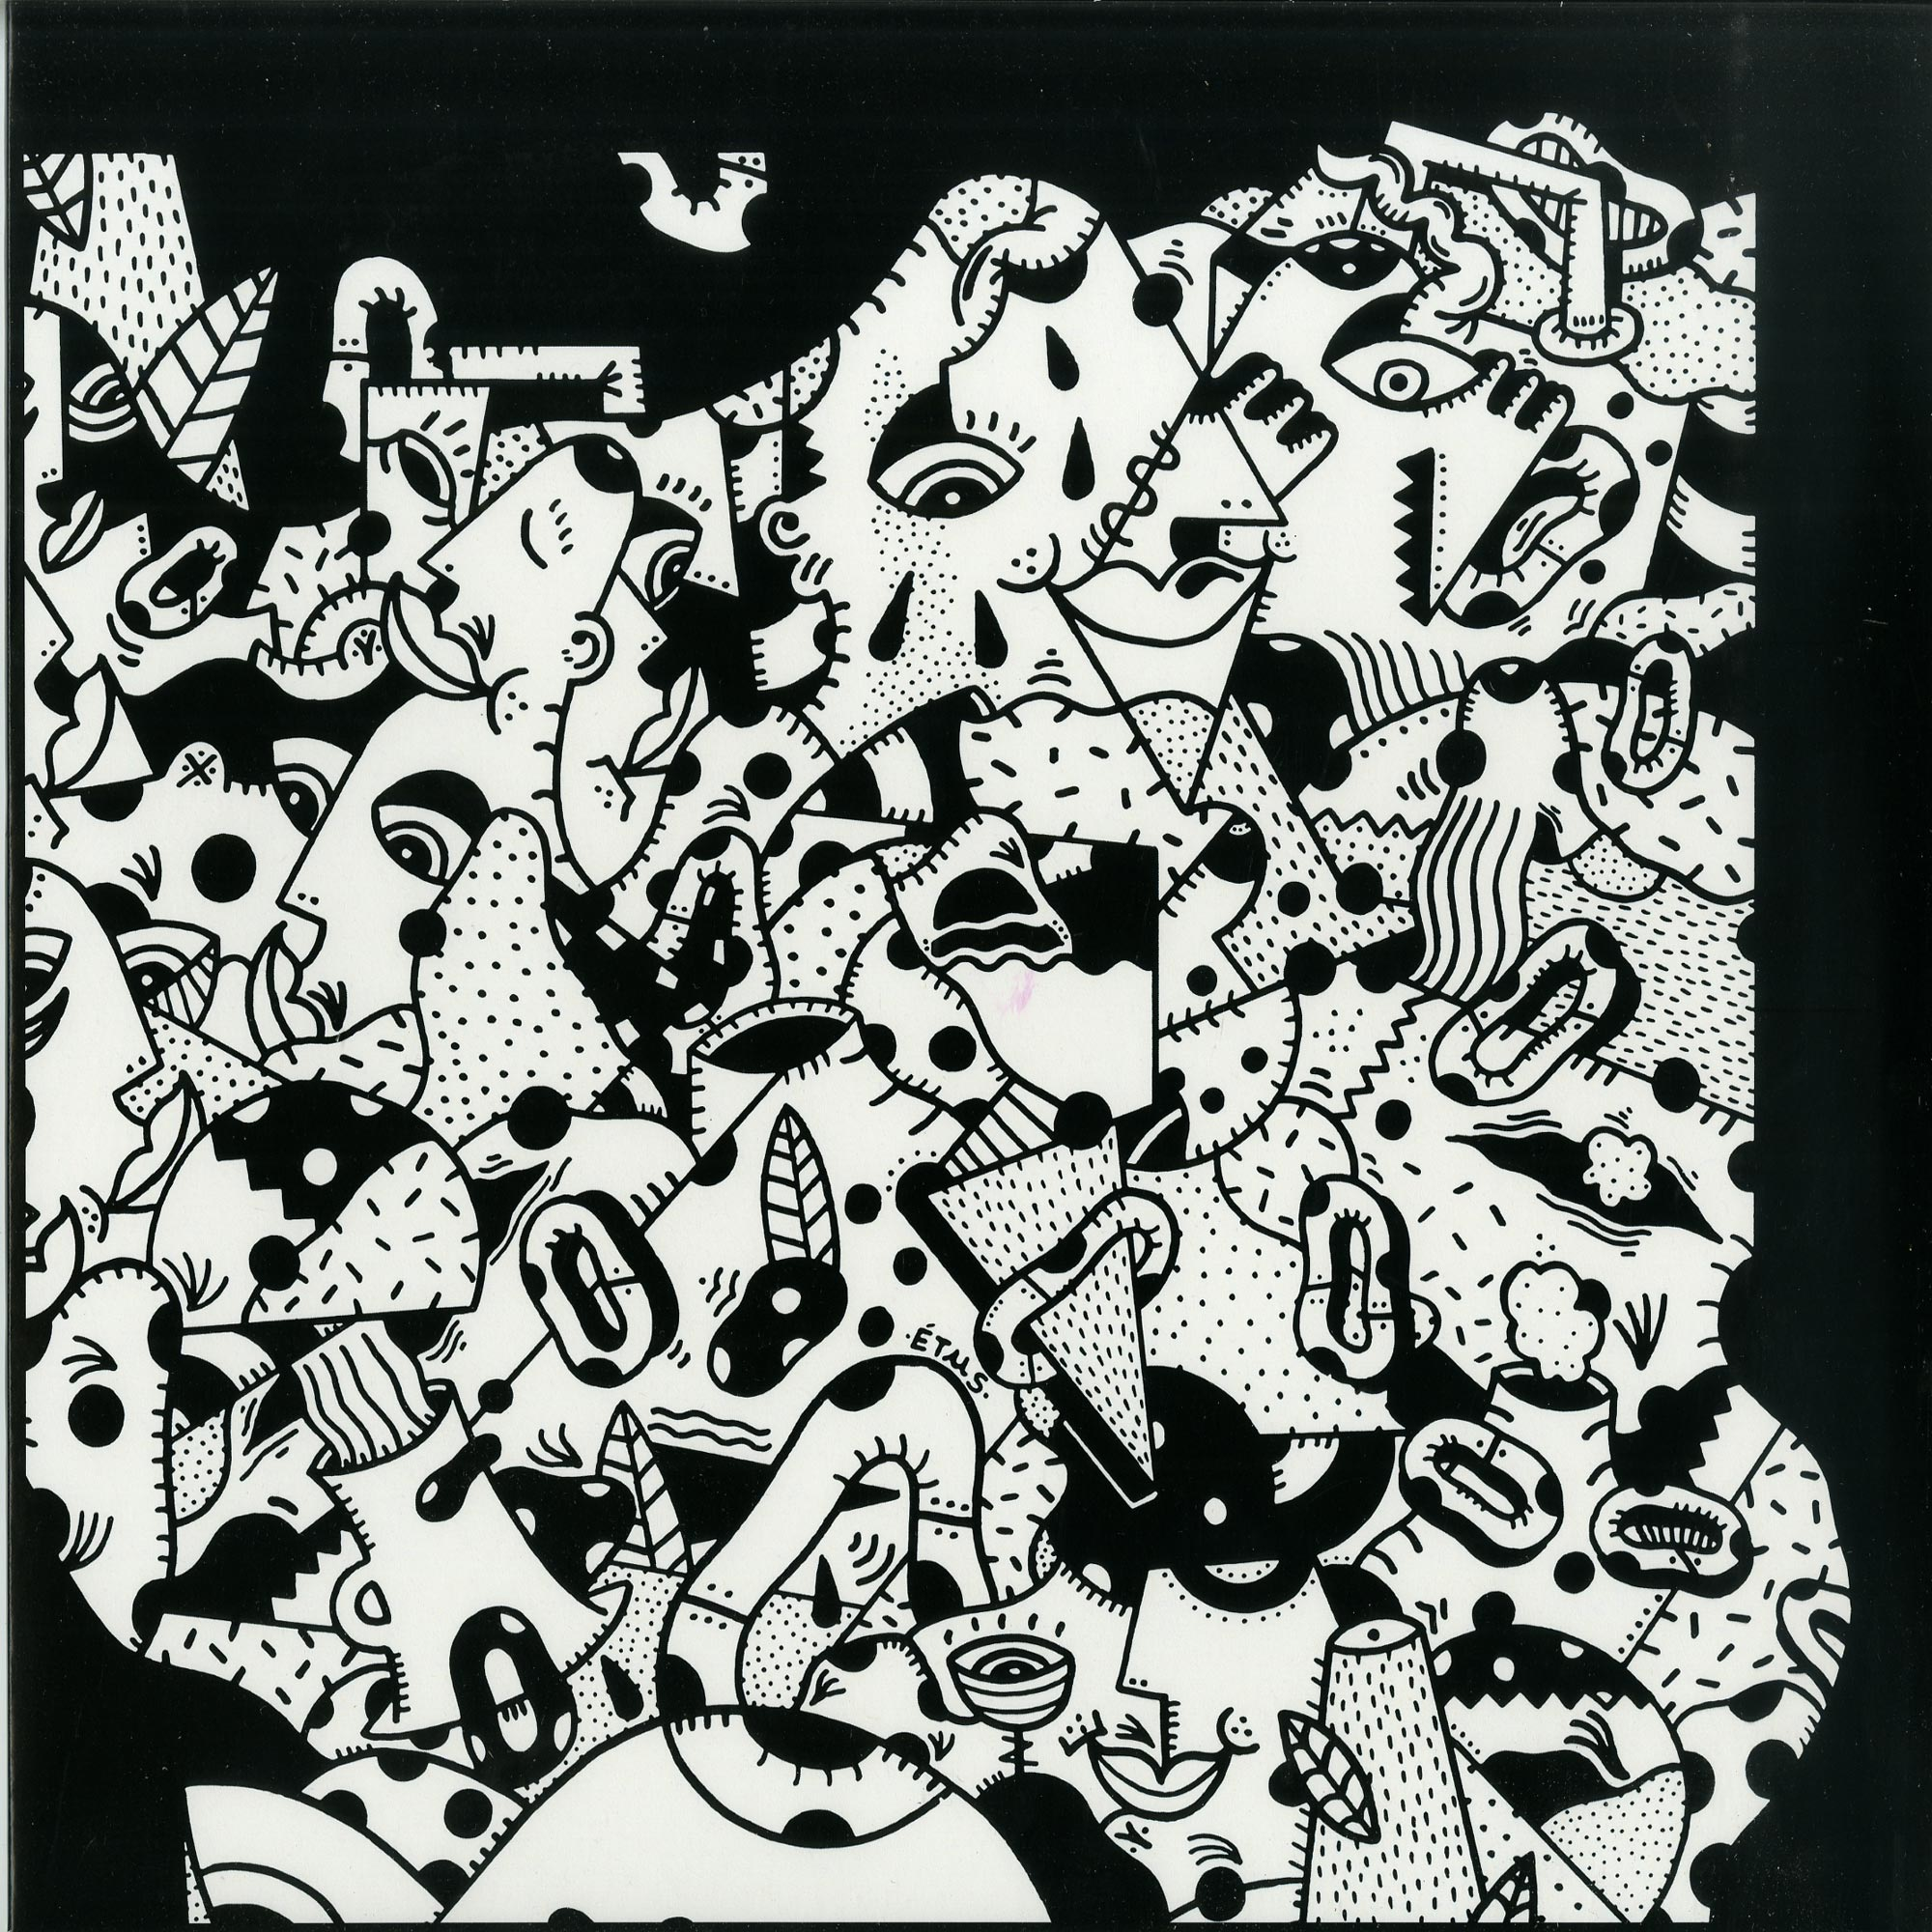 Ricco, Pletnev, Ju-Ju83, Roe Deers, Markus Gibb - VARIOUS ARTISTS 1